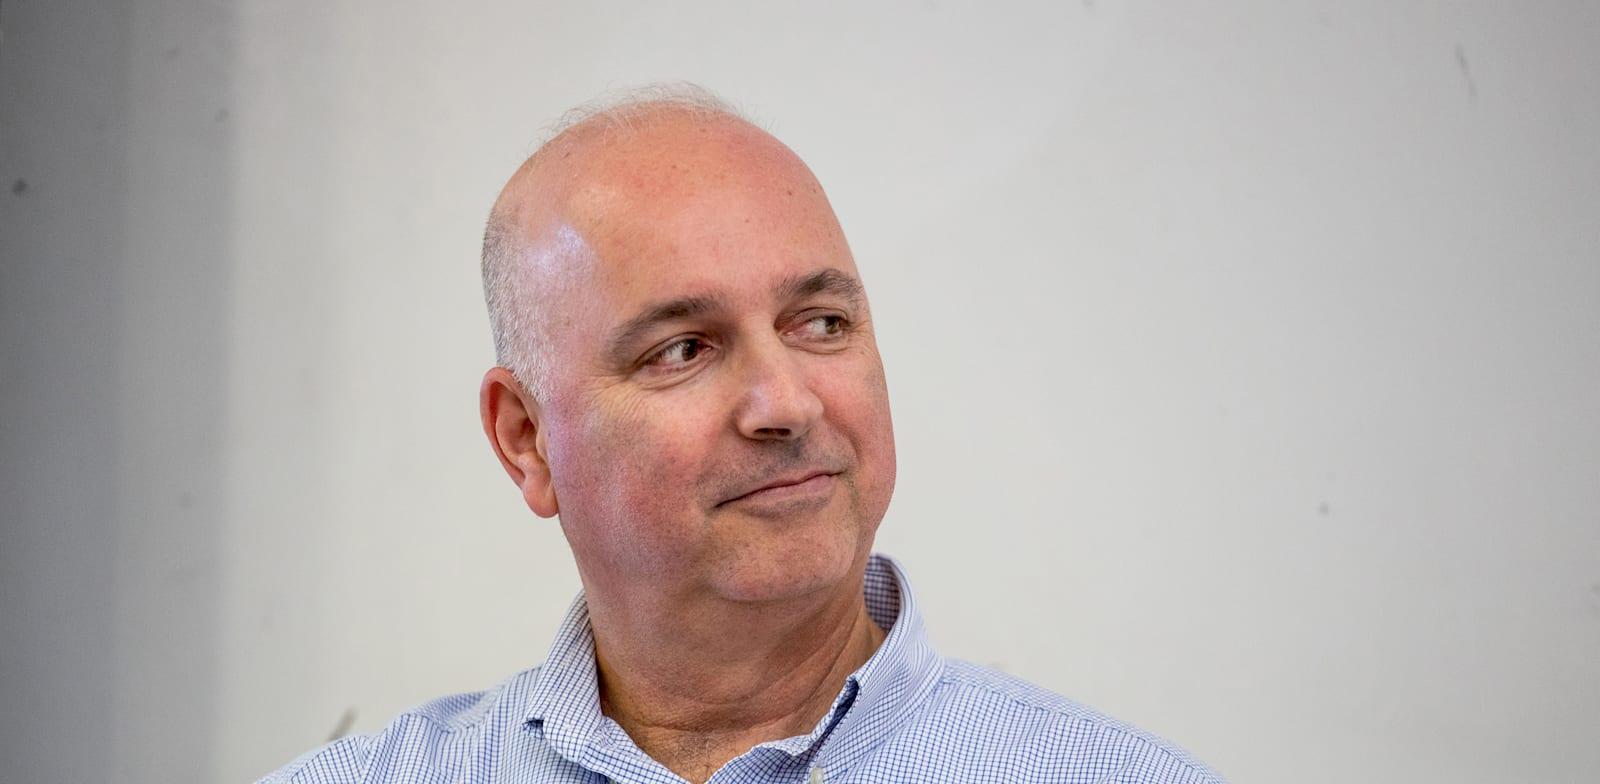 אילן רביב, מנכ''ל מיטב דש / צילום: כדיה לוי